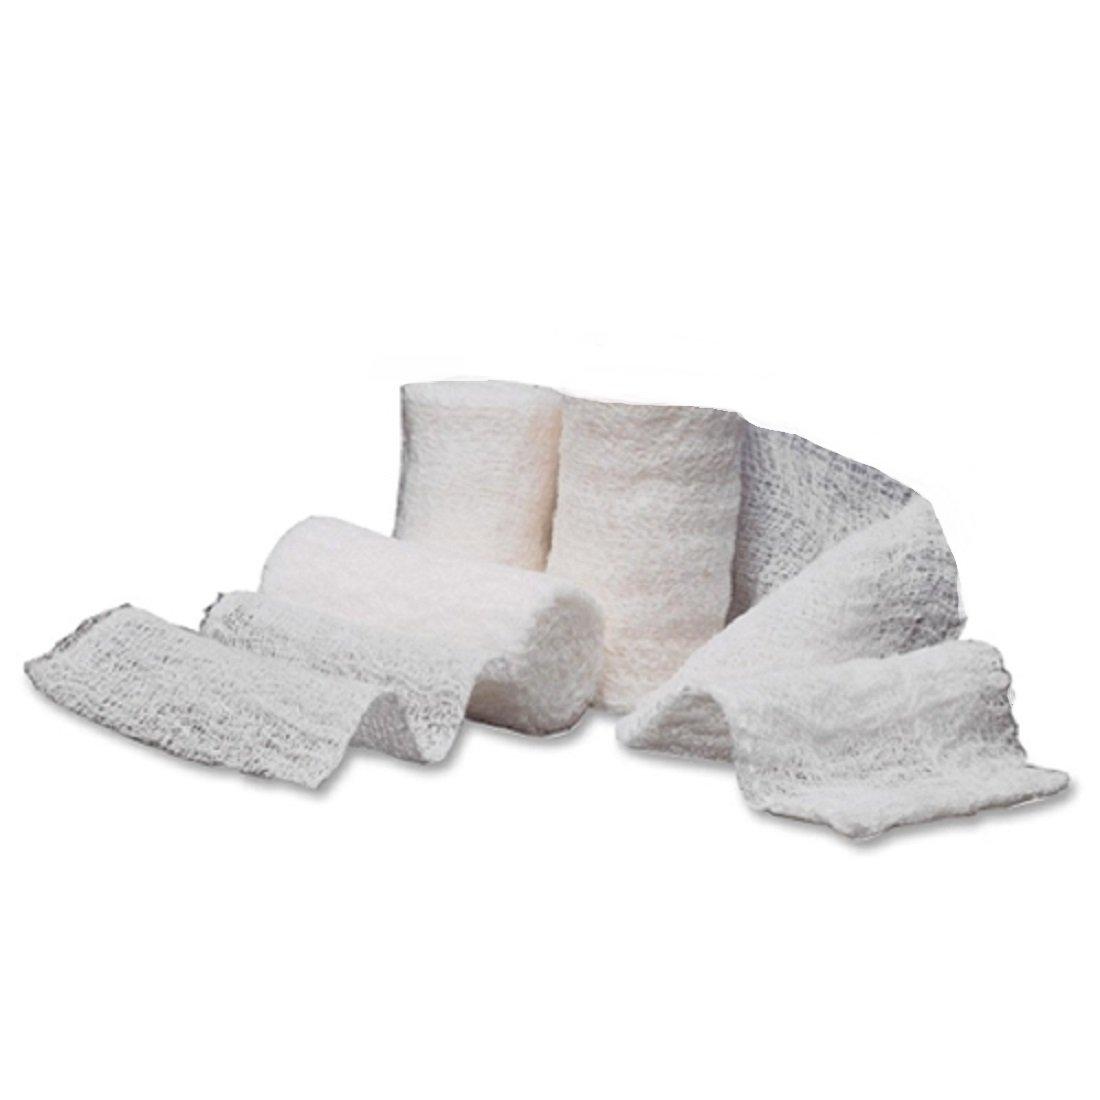 McKesson Performance Roll Gauze Bandage Non Sterile Gauze 4.5'' - Case of 100 - Model 30642000 by McKesson Brands